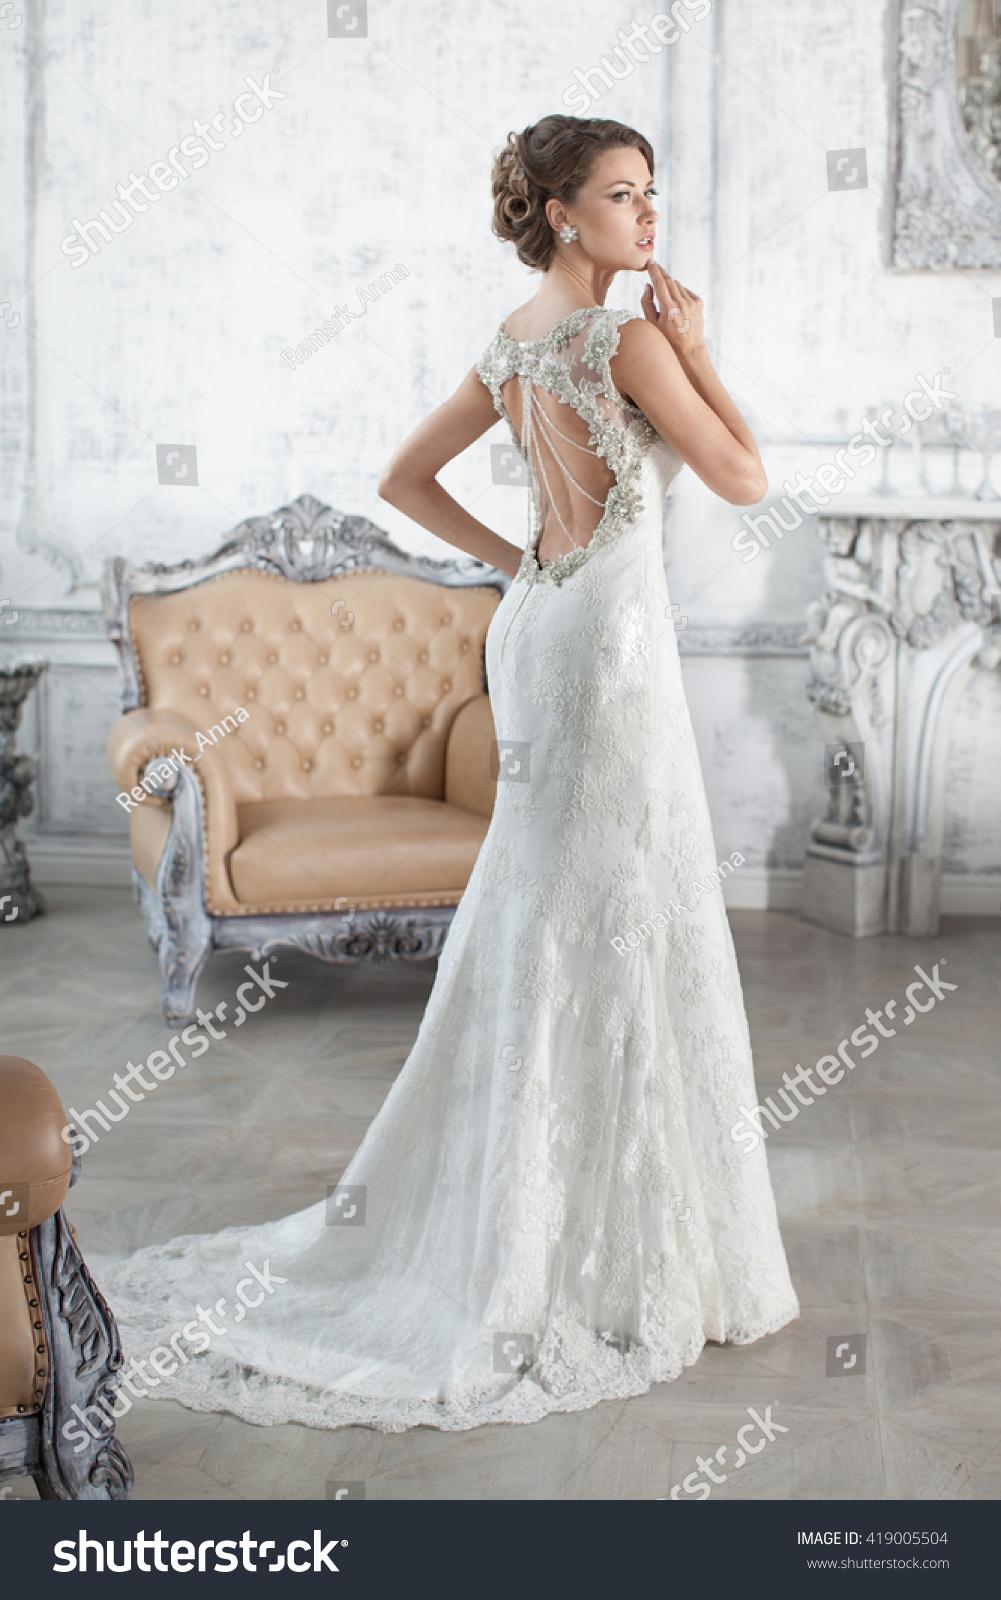 Bride Wedding Dress His Apartment Paris Stock Photo (Edit Now ...